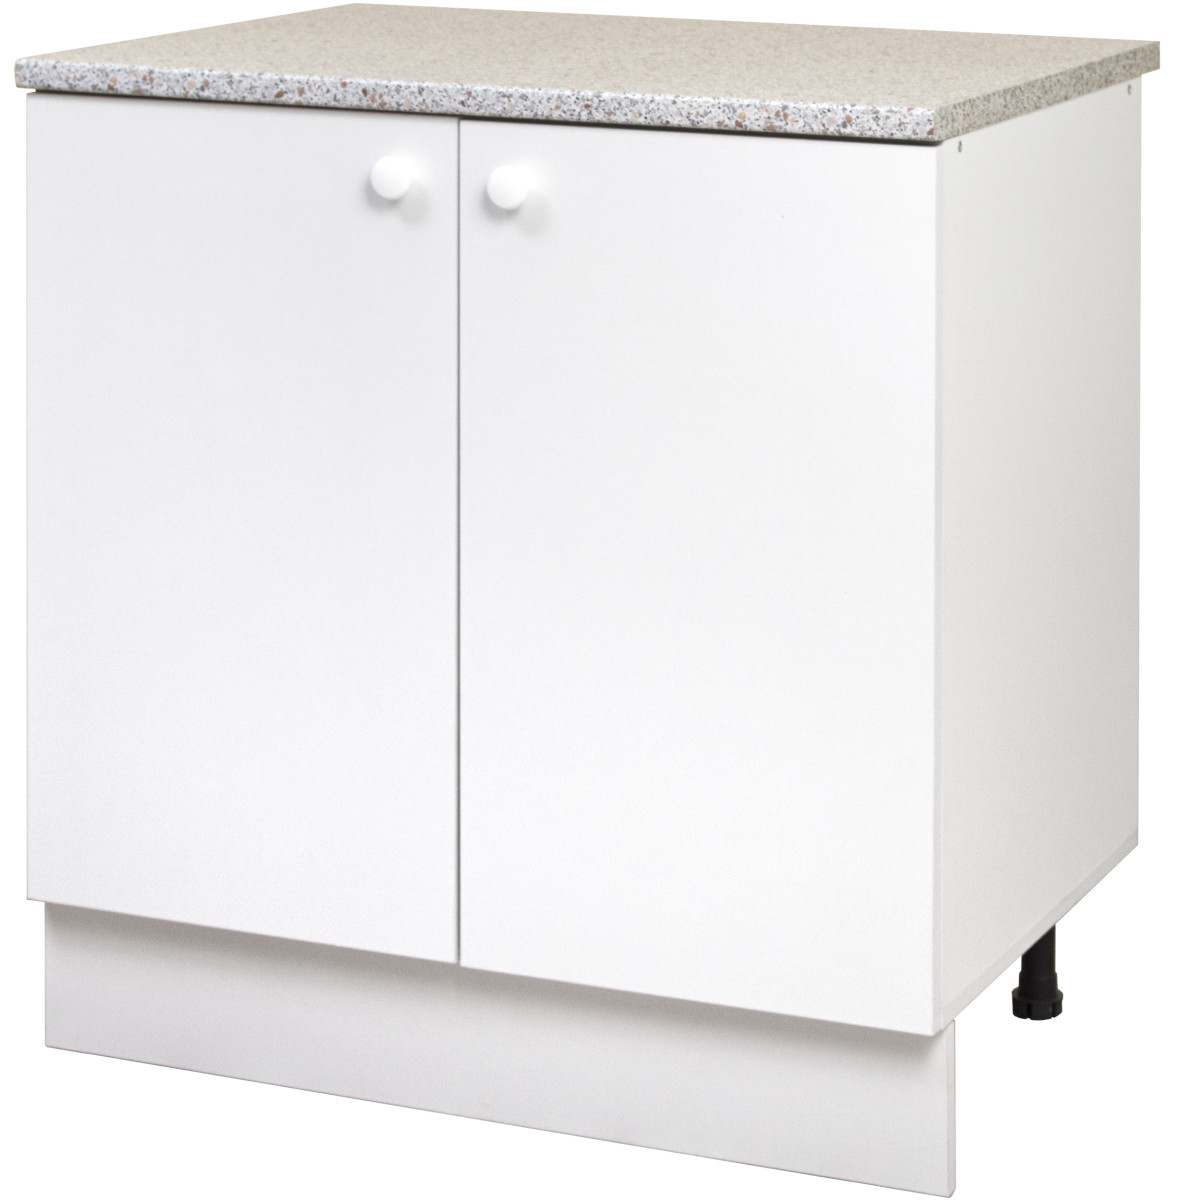 Шкаф напольный Бэлла 80x86x60 см ЛДСП цвет белый